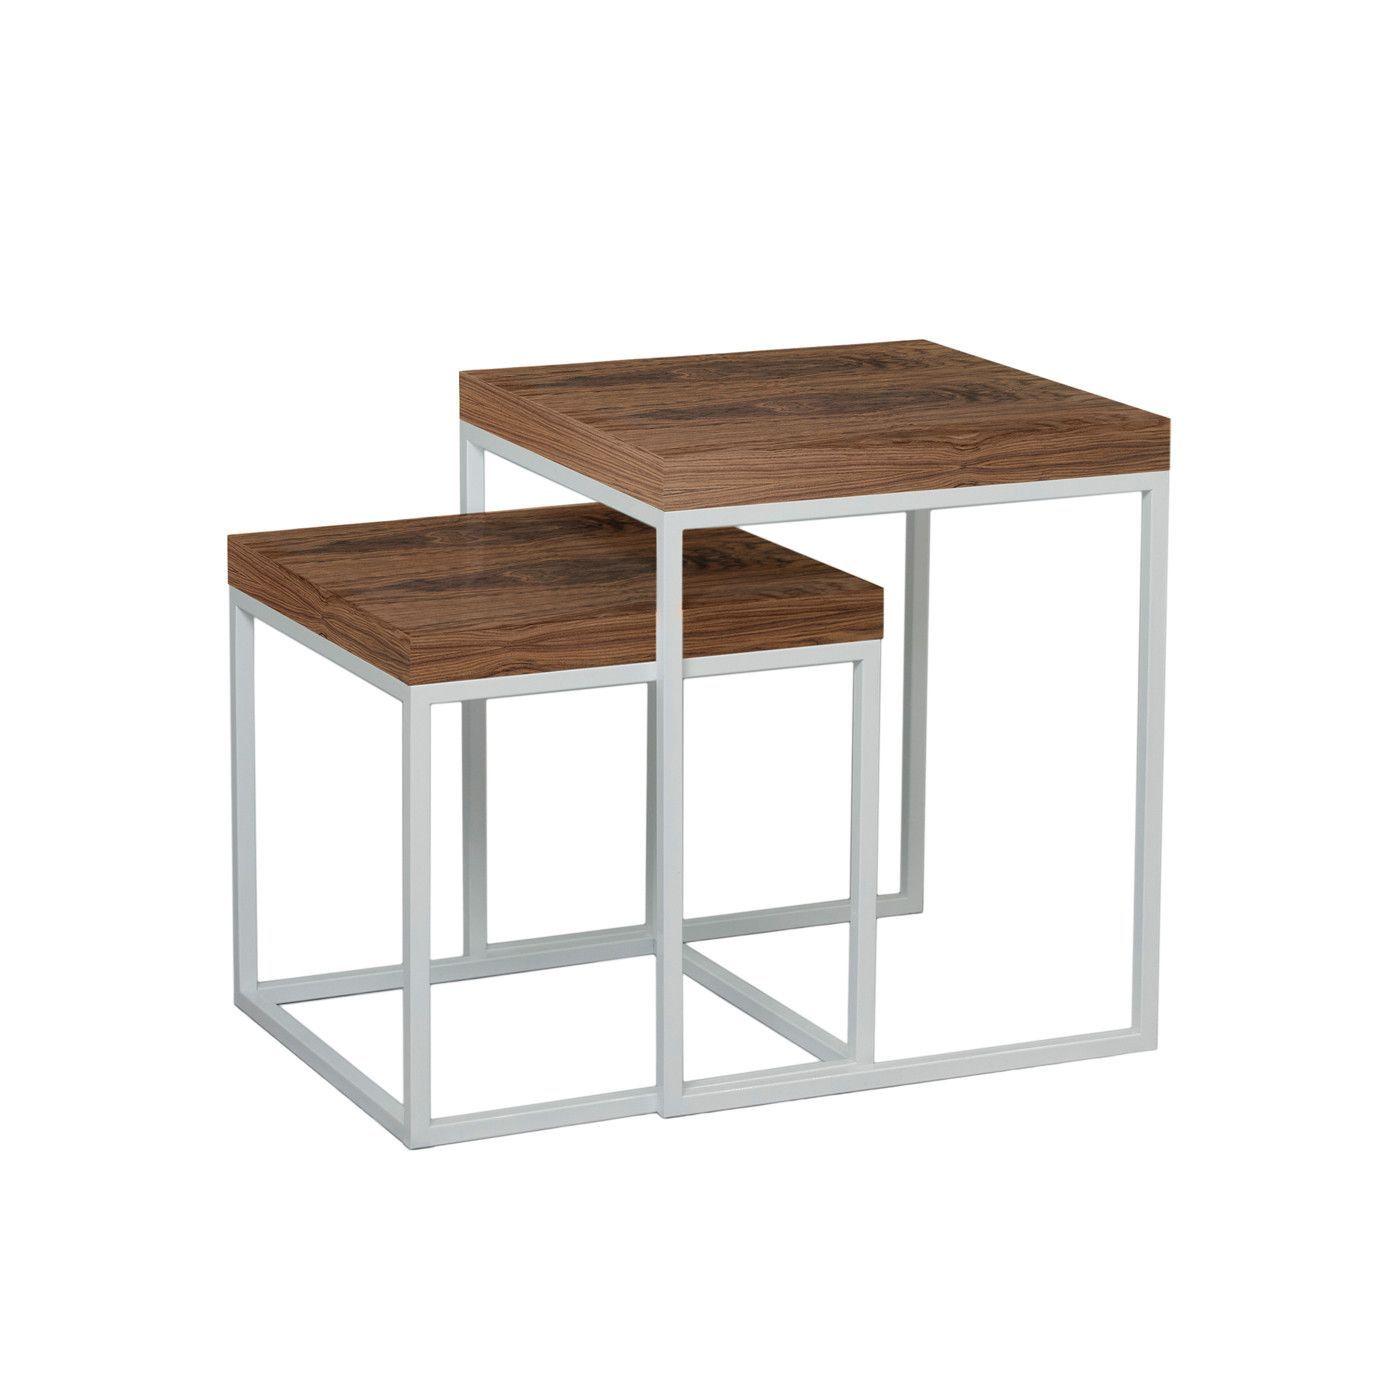 Prairie Nesting Tables Walnut Tops / Chrome Legs